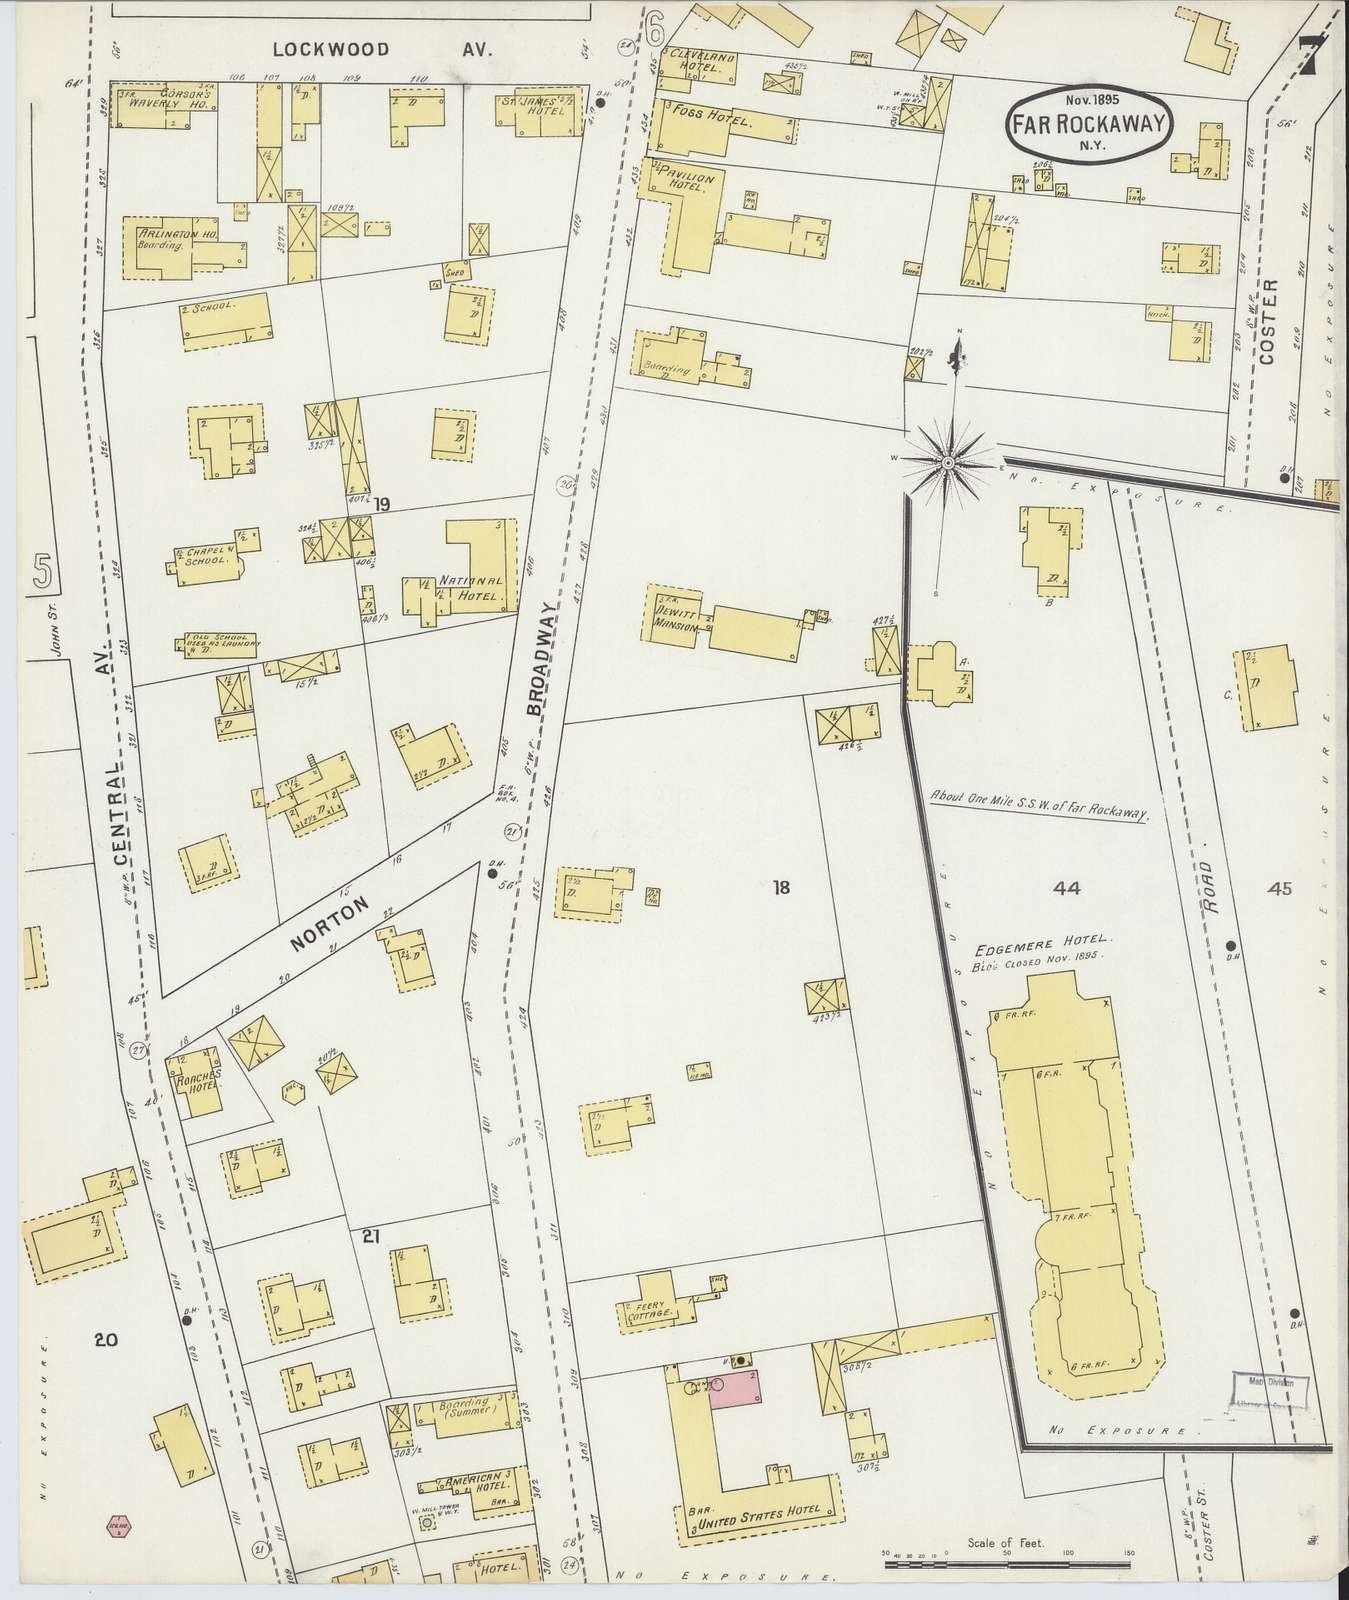 Sanborn Fire Insurance Map from Far Rockaway, Queens County, New York